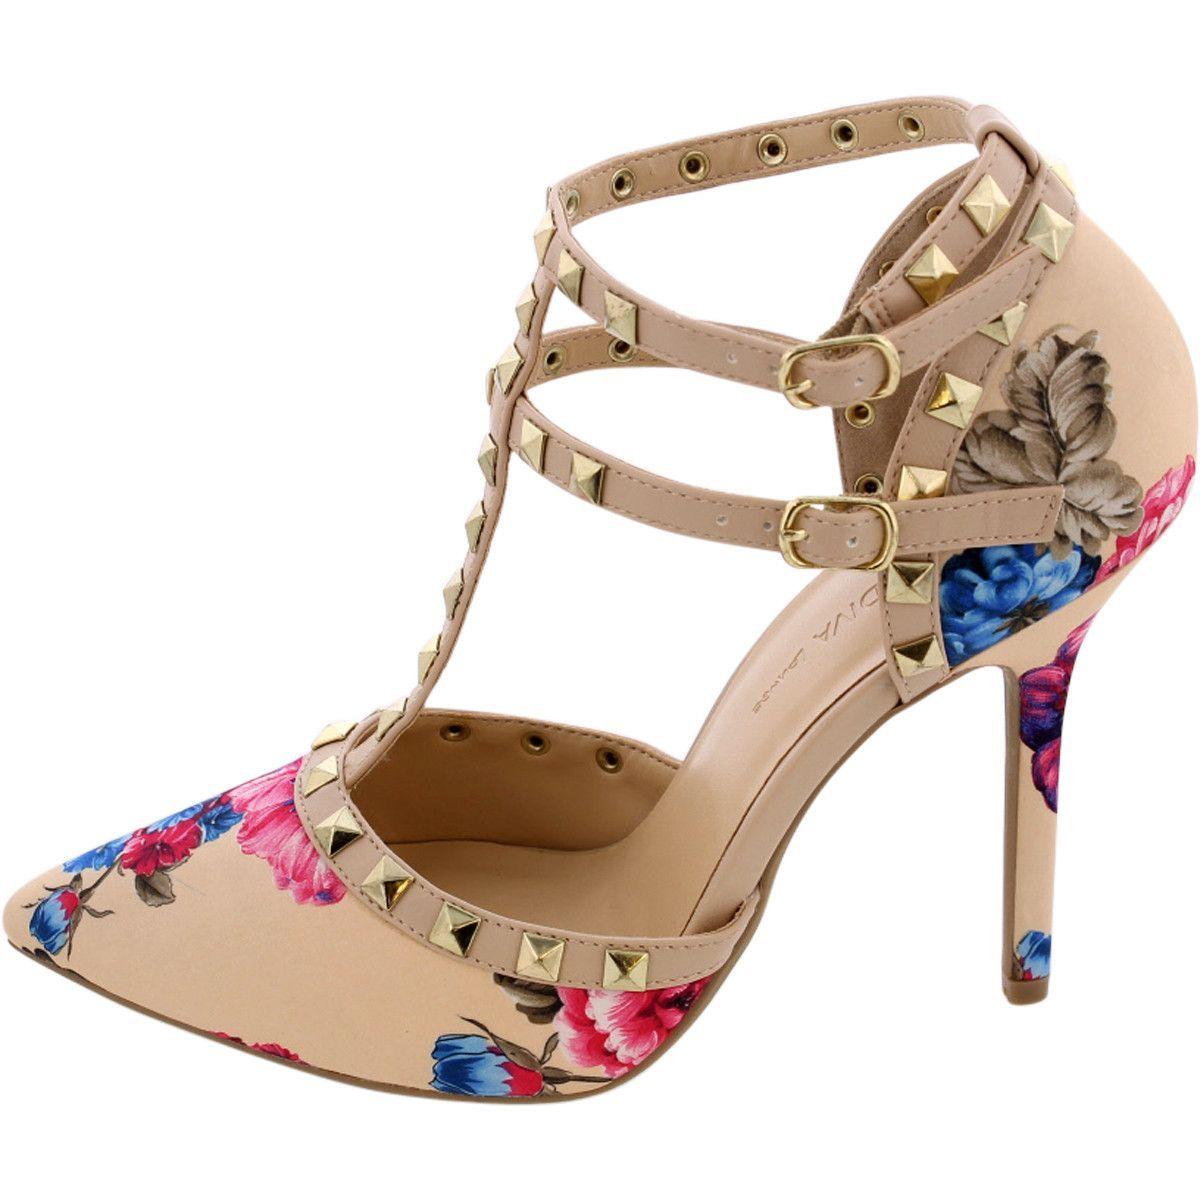 Wild Diva Lounge - Women's Pointy Studded Heel - Beige/Floral ...